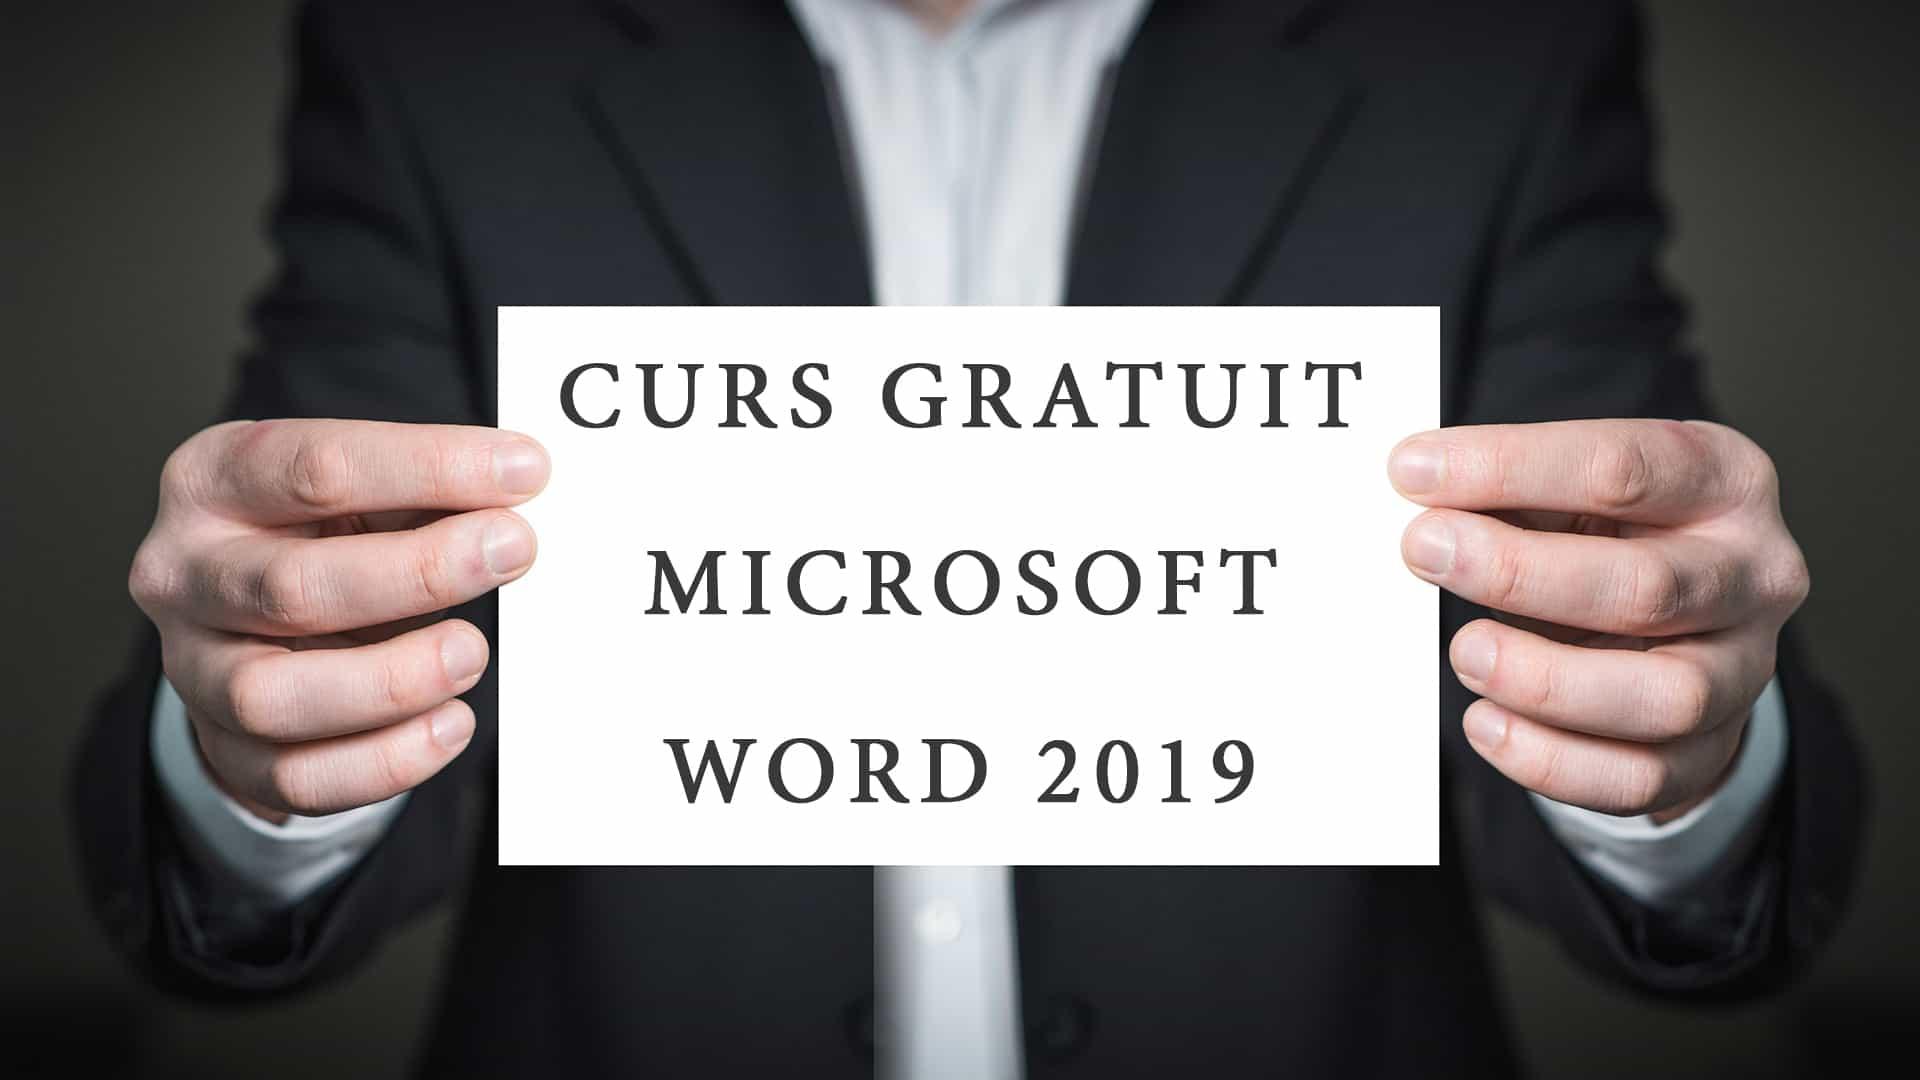 Curs gratuit Microsoft Word